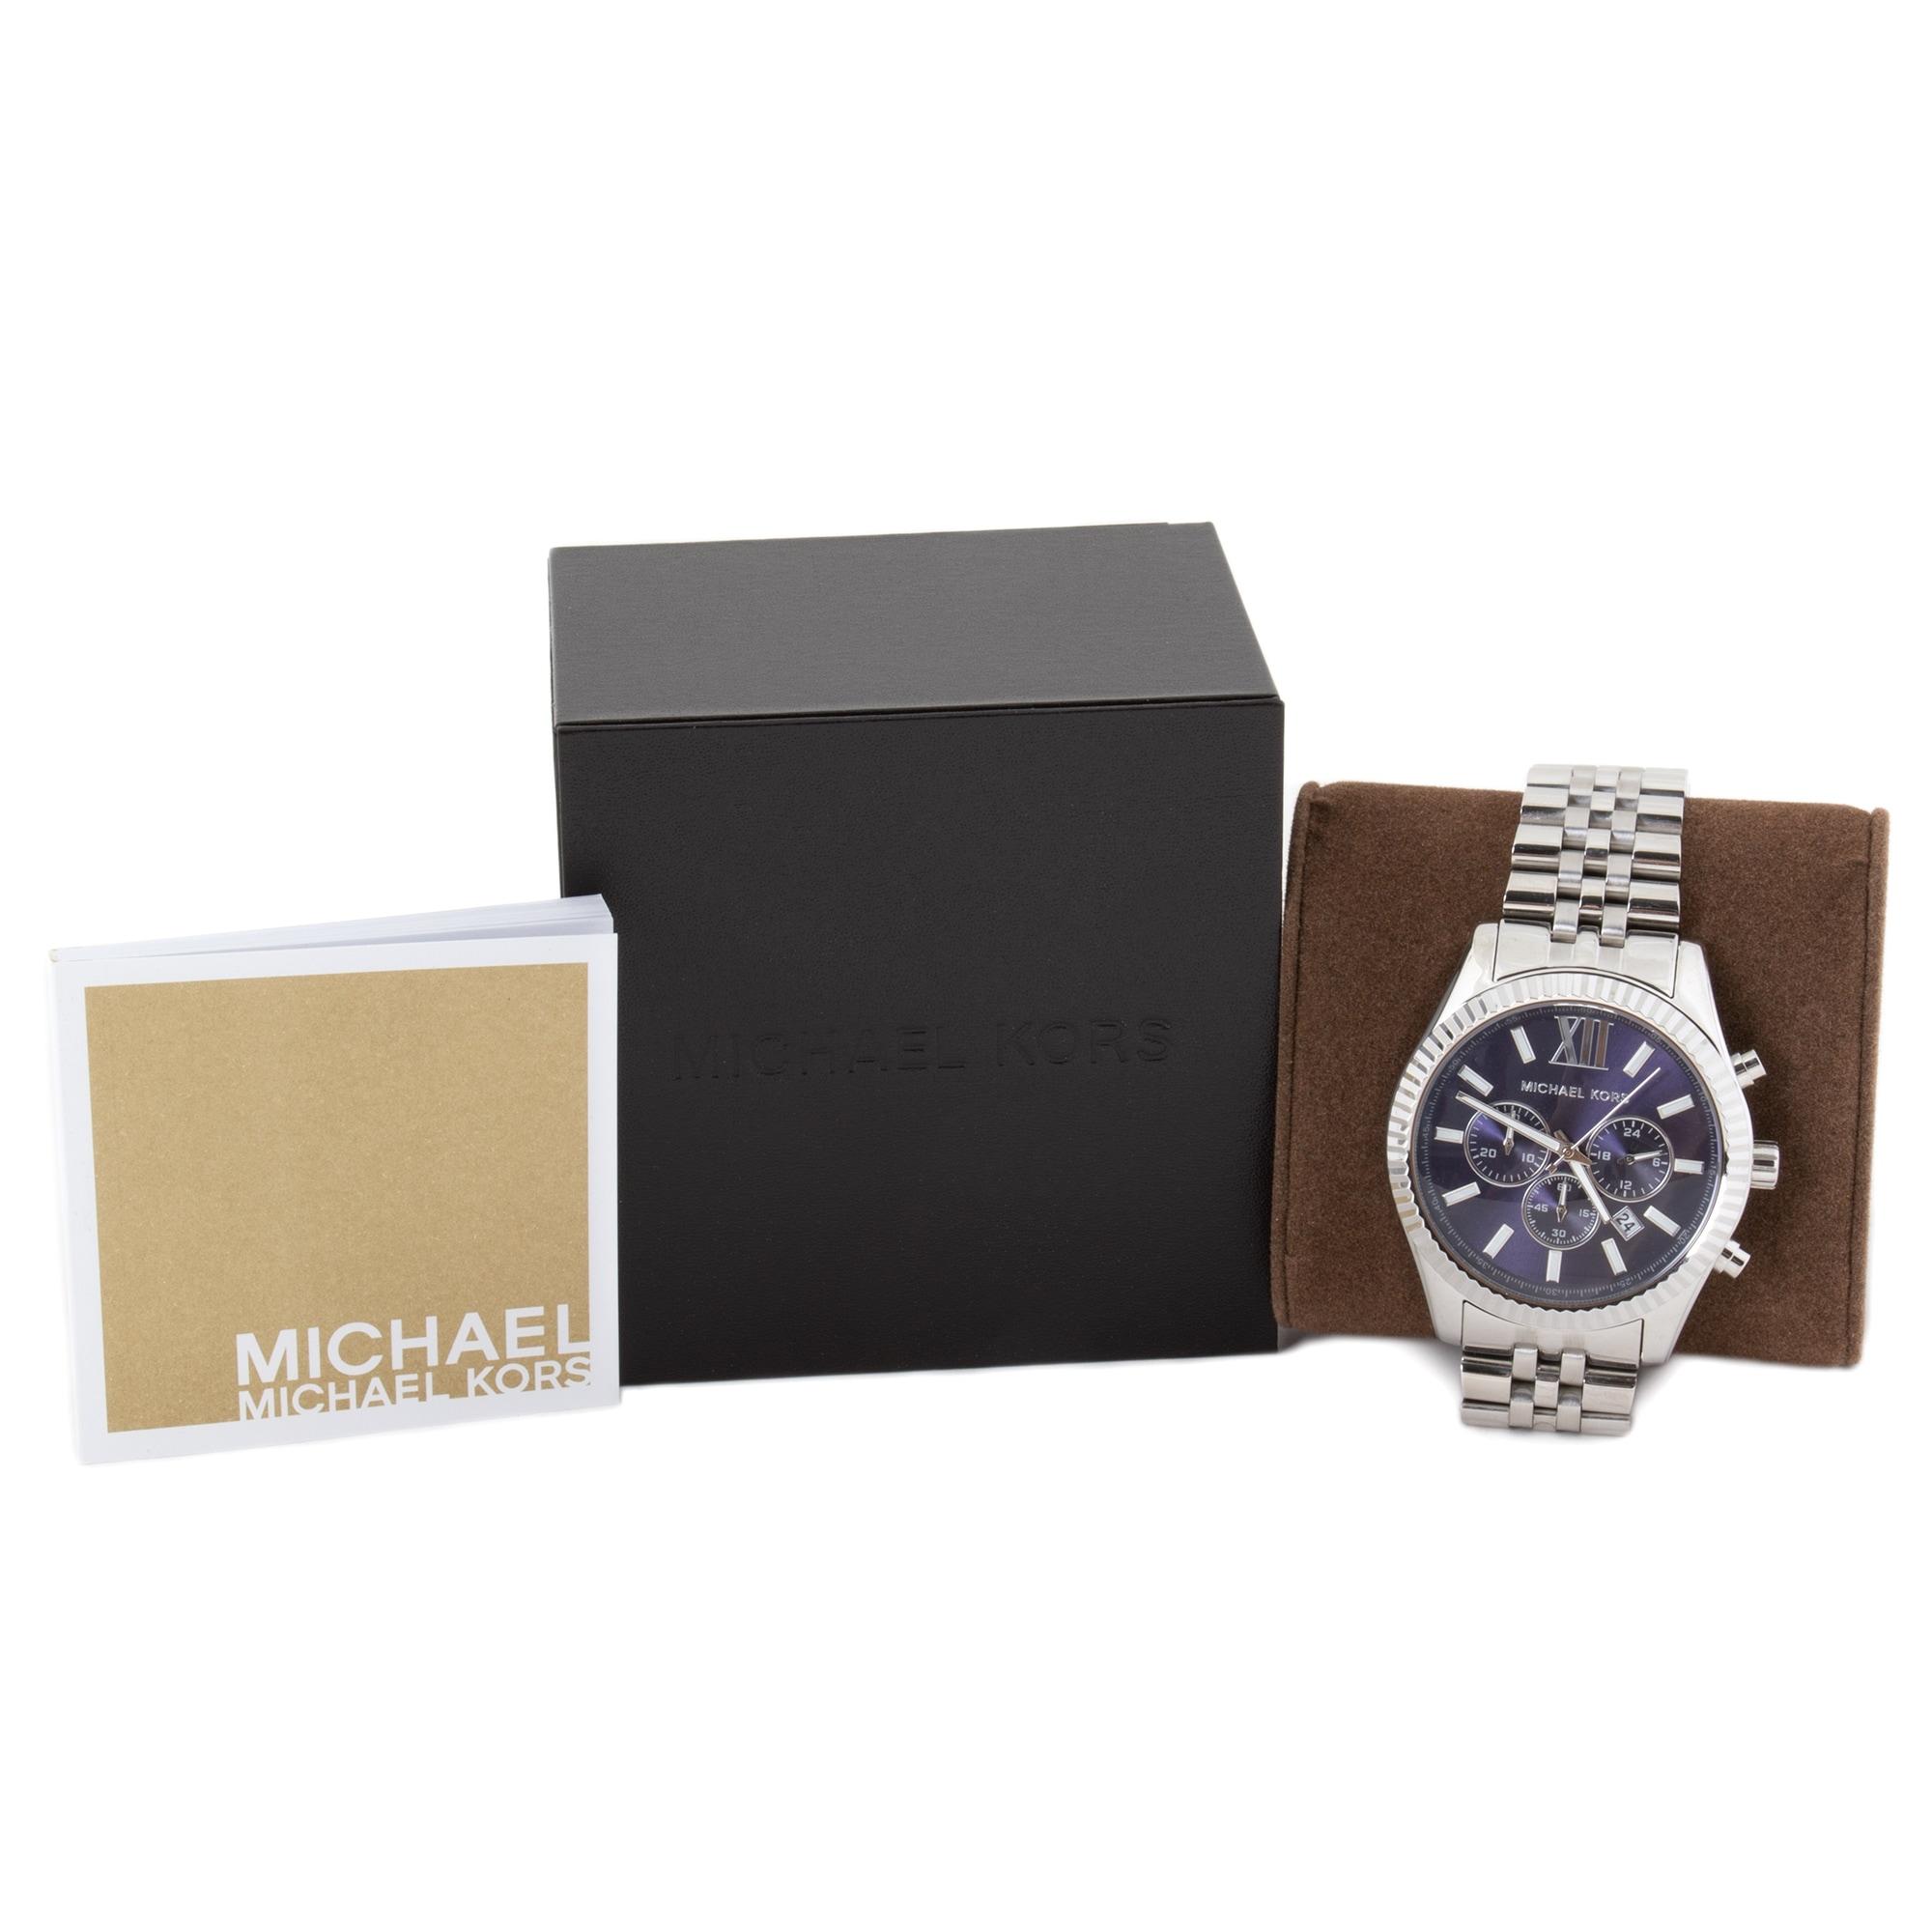 b1eb51a05131 Shop Michael Kors Lexington Chronograph Mens Watch MK8280